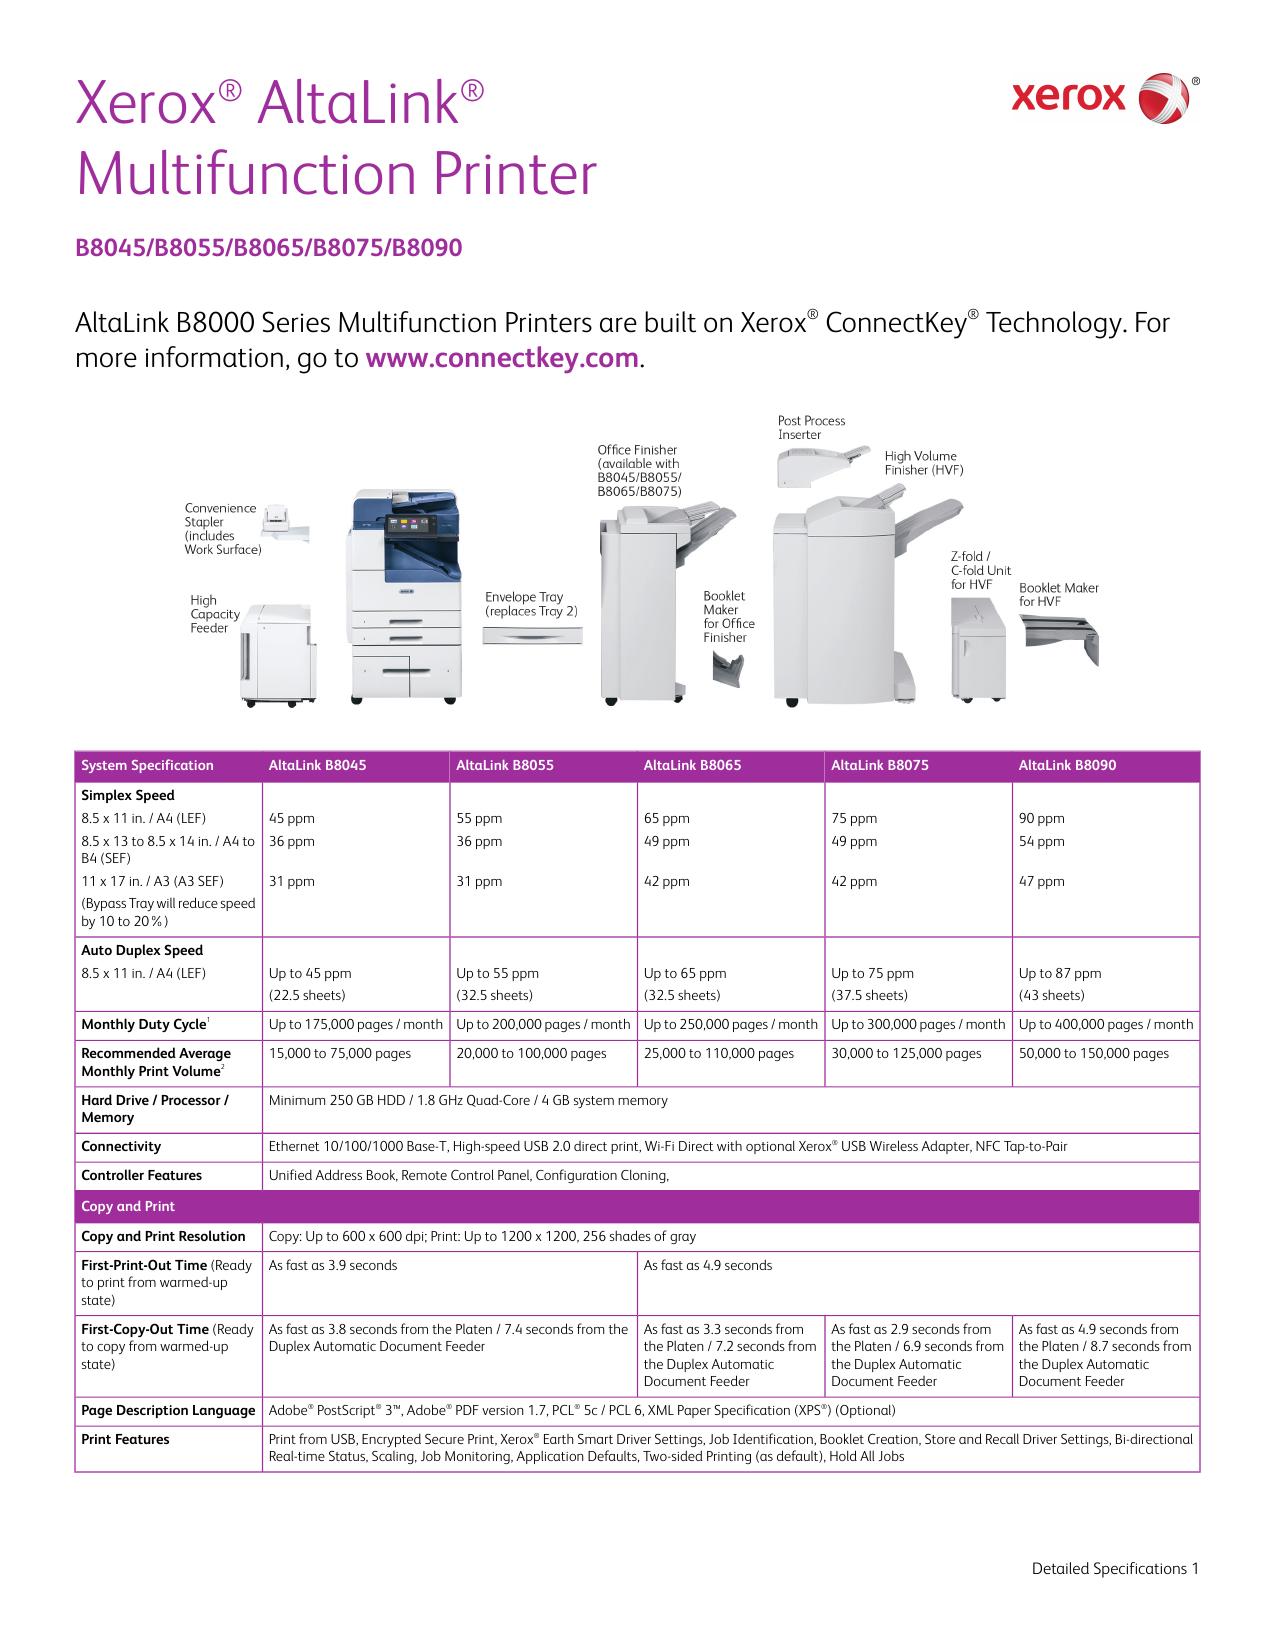 AltaLink B8045 / B8055 / B8065 / B8075 / B8090 (PDF, 520